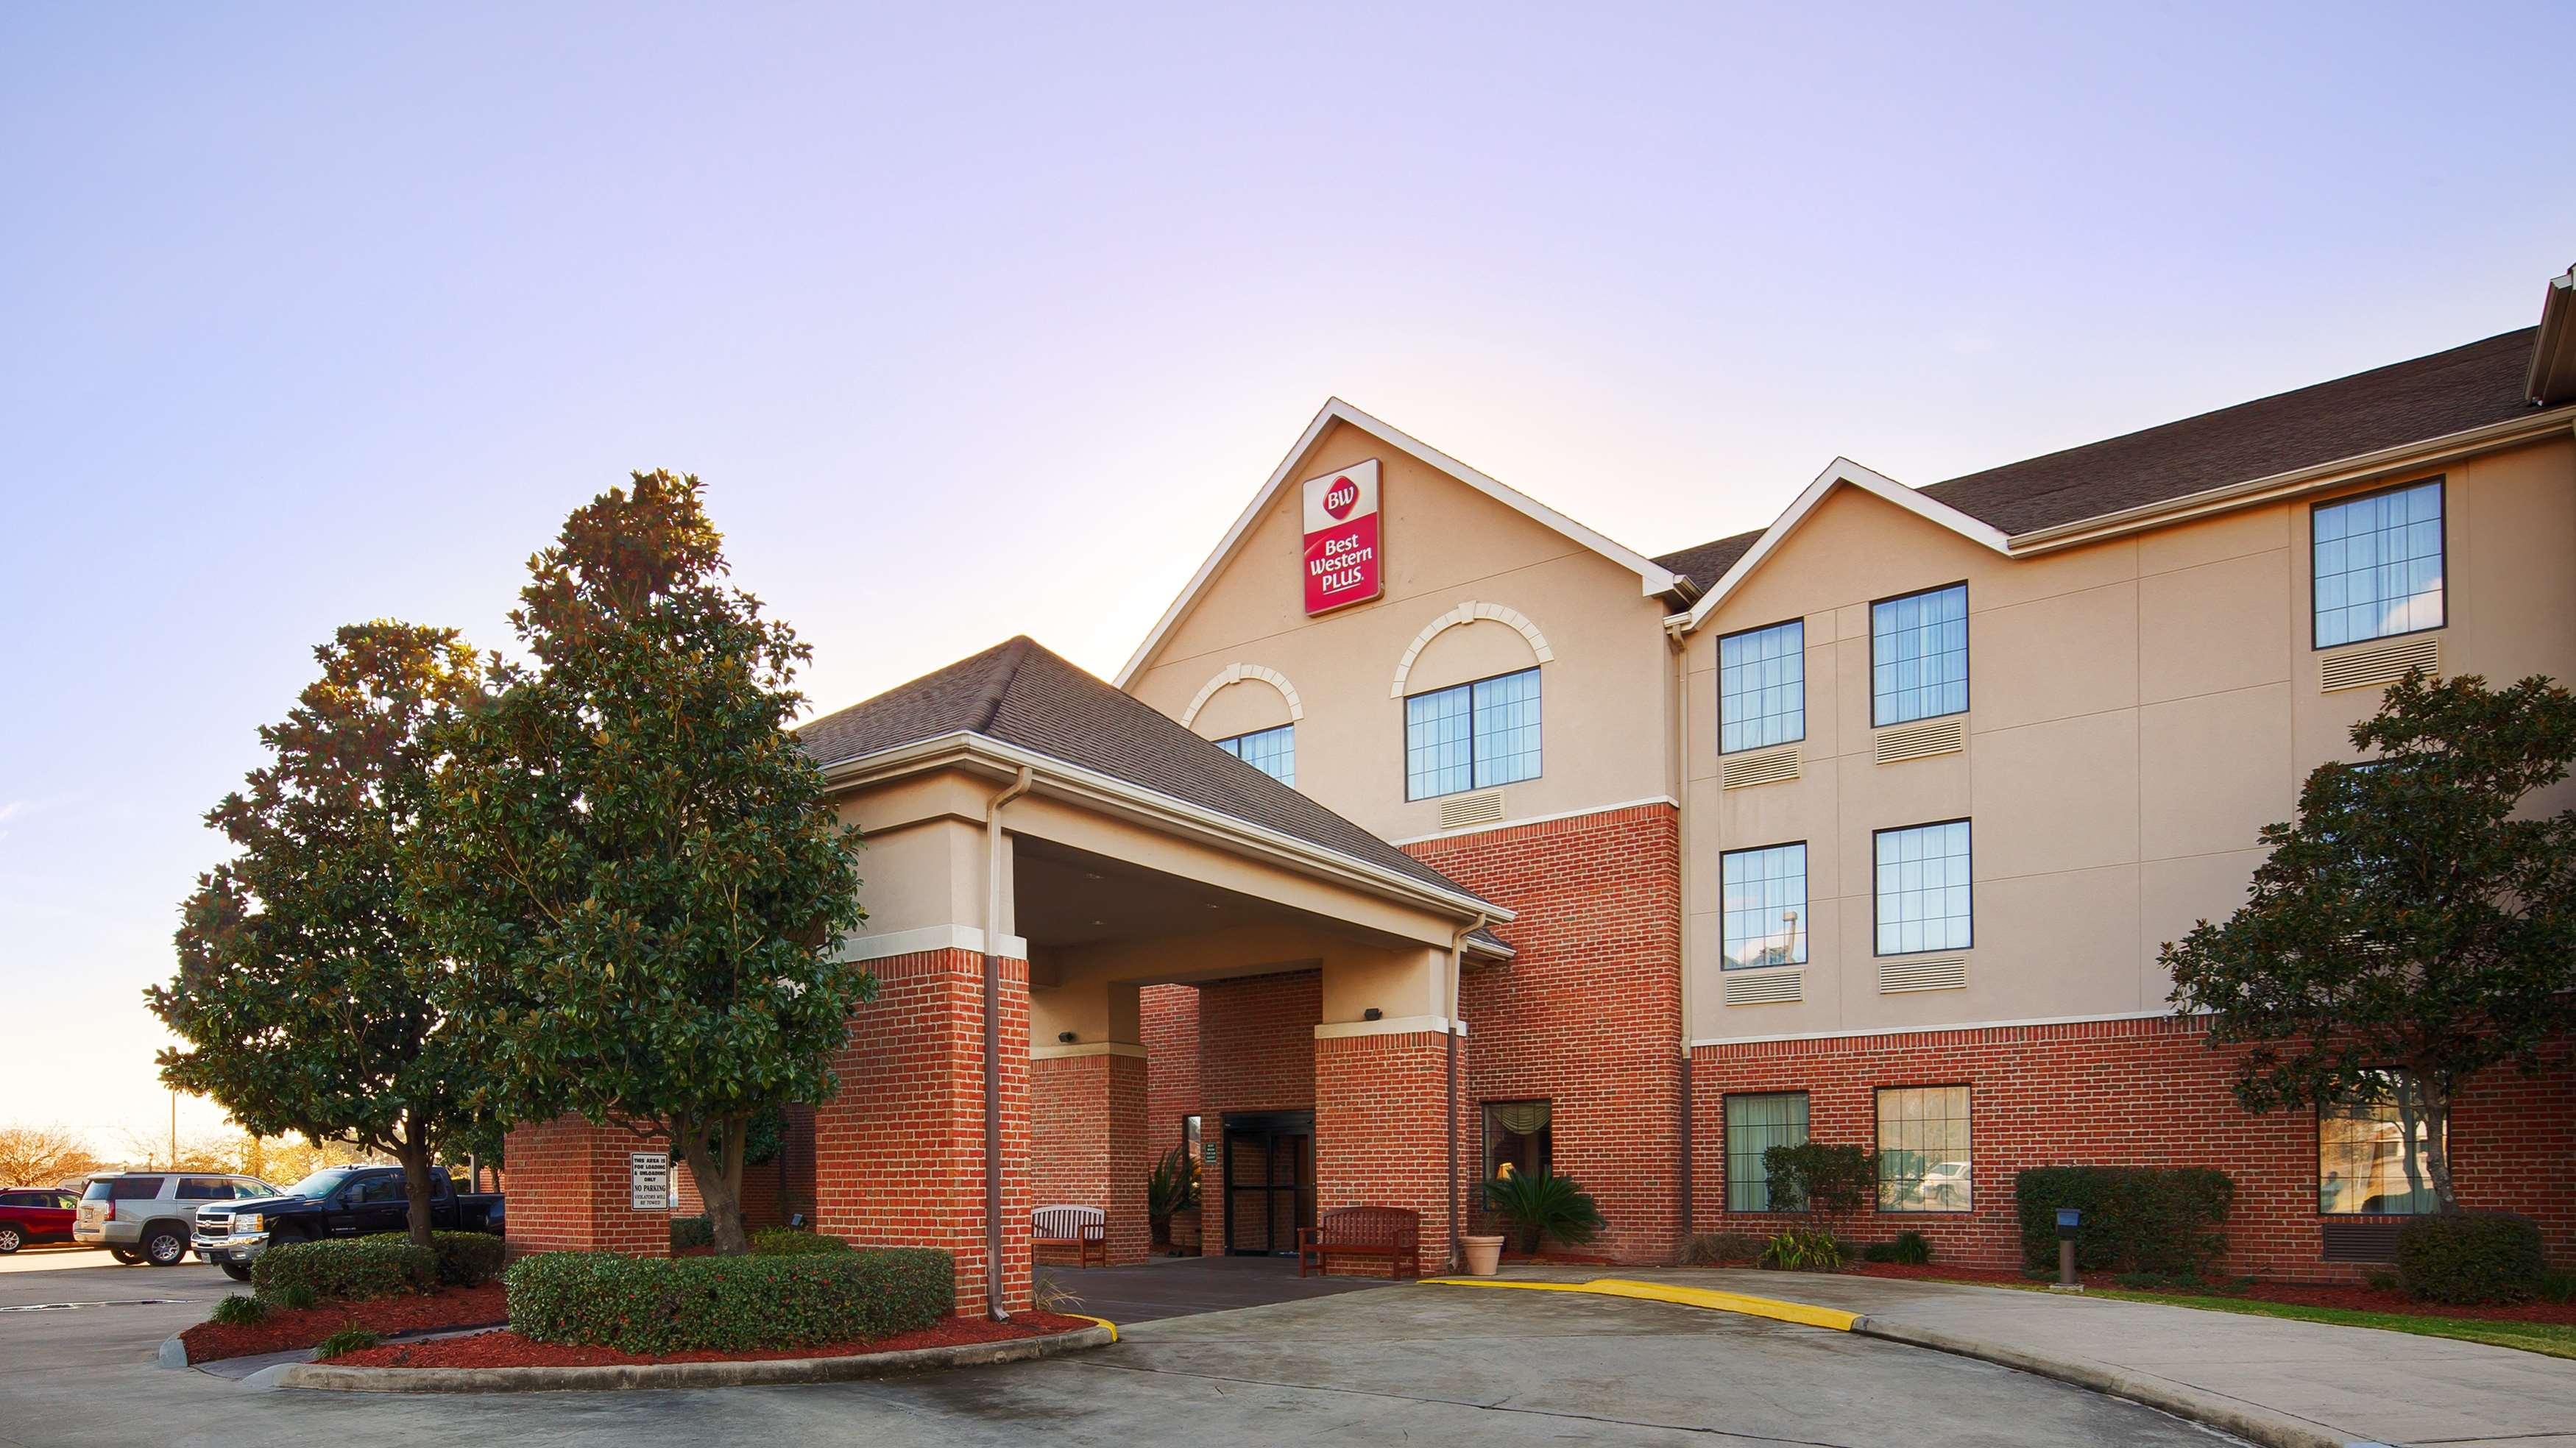 Best Western Plus Executive Hotel & Suites image 0